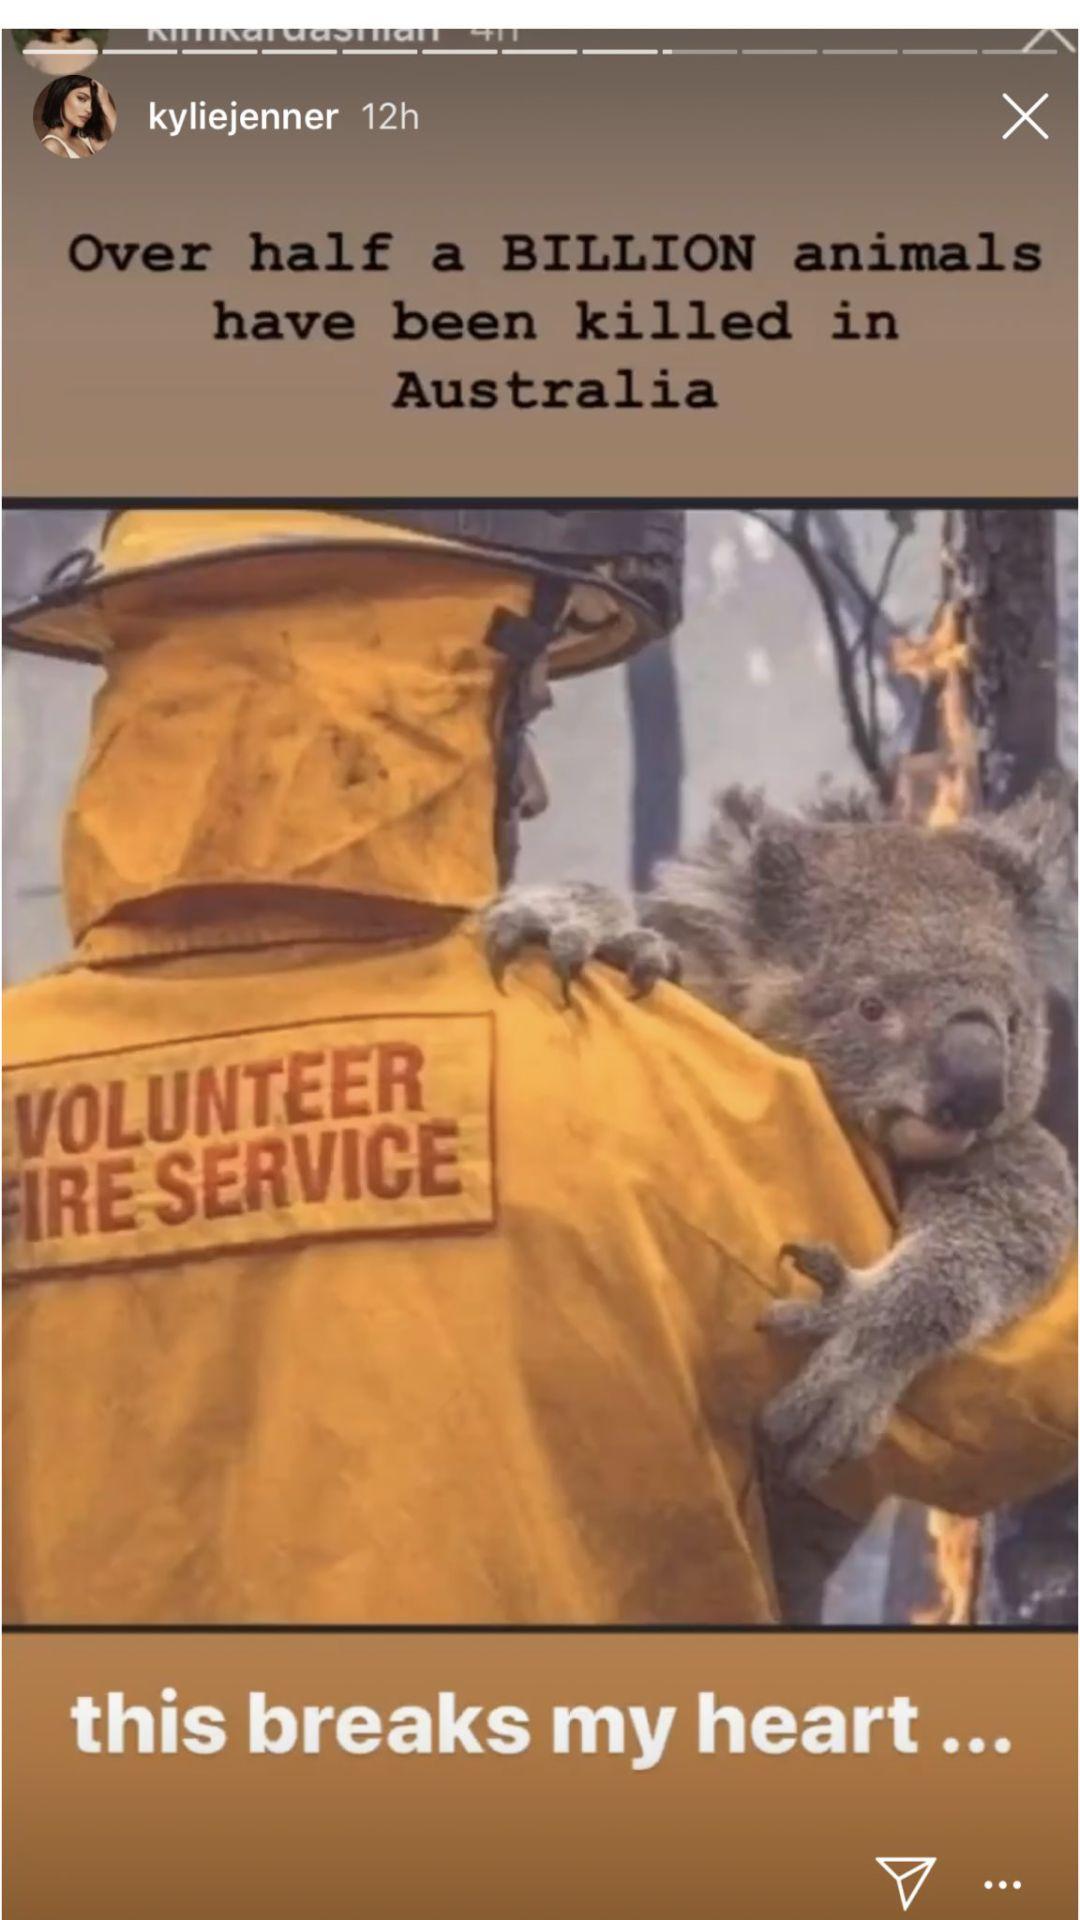 Kylie Jenner Koala